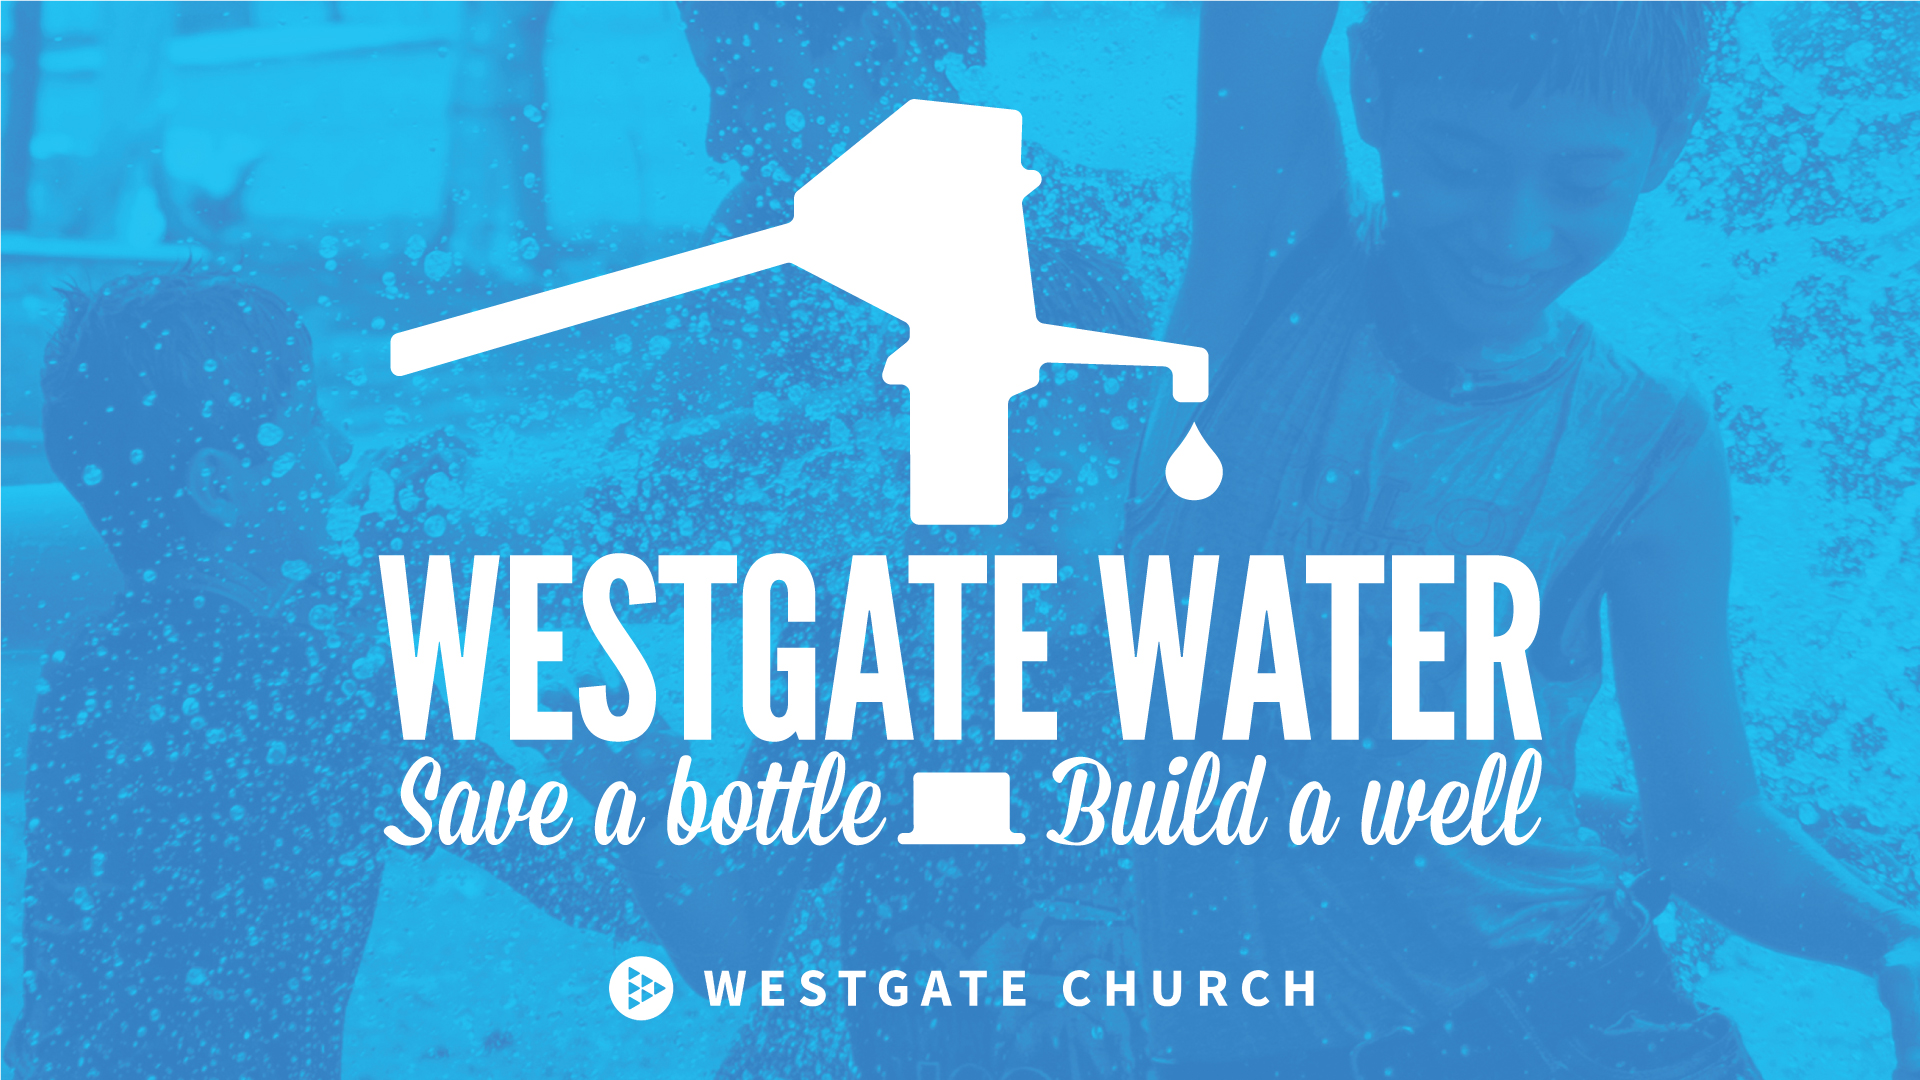 WestGateWater_slide_2019.jpg